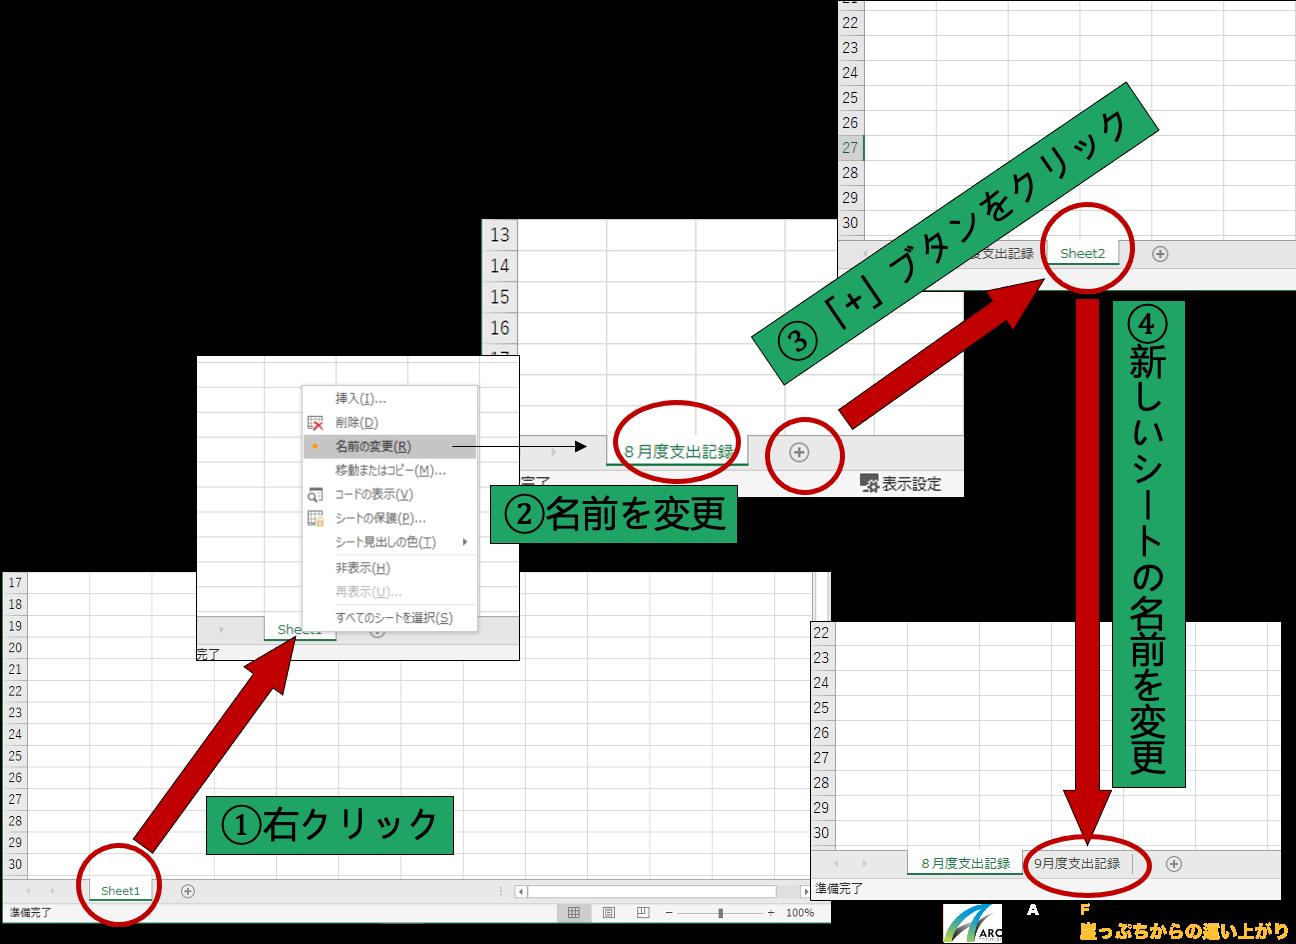 Excelの新しいワークシートを作成し、シート名を変更する